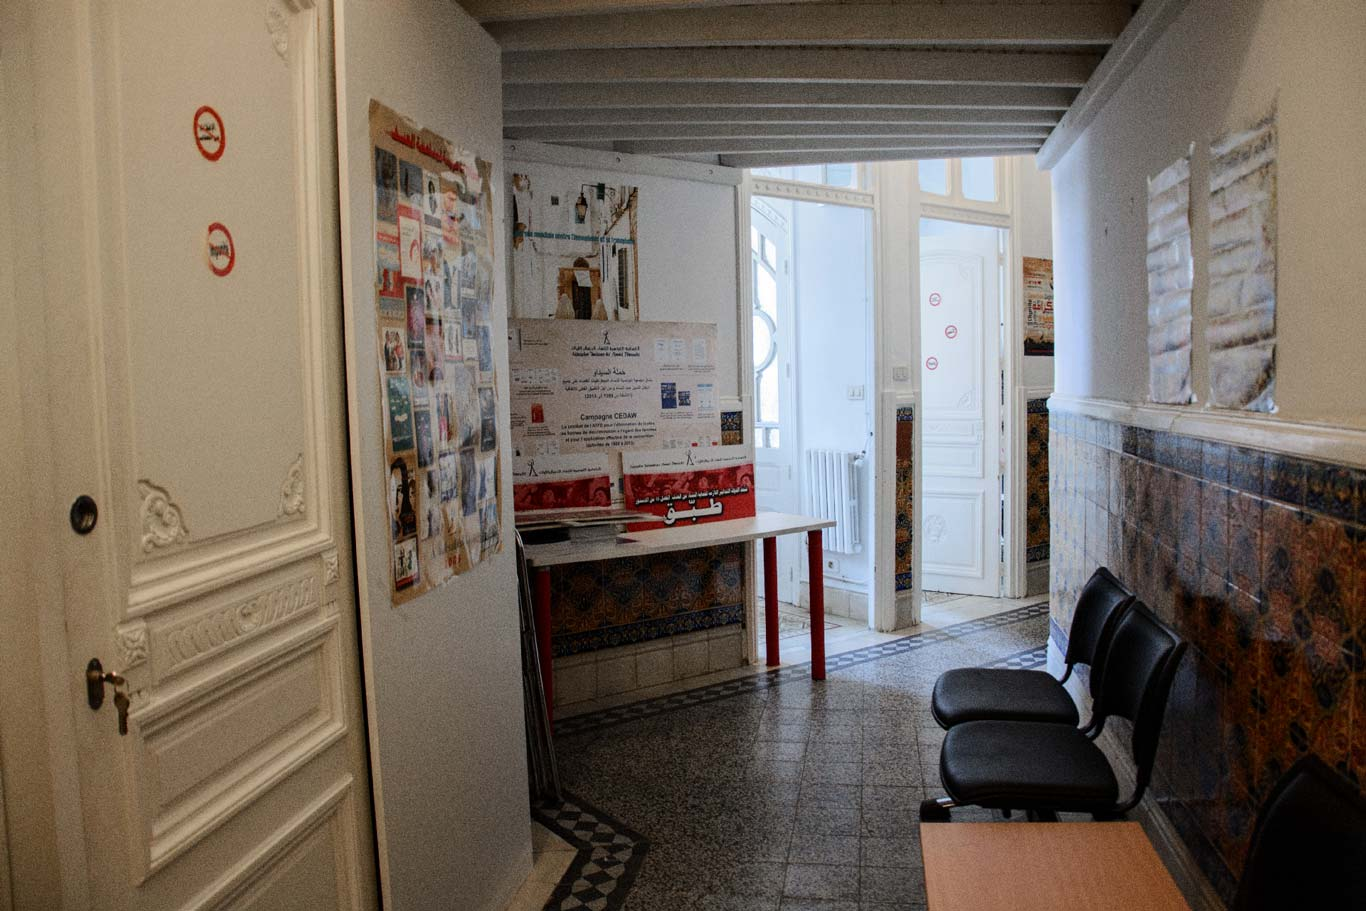 atfd-ceofvv-ecoute-violences-accueil-centre-tunisie-inkyfada